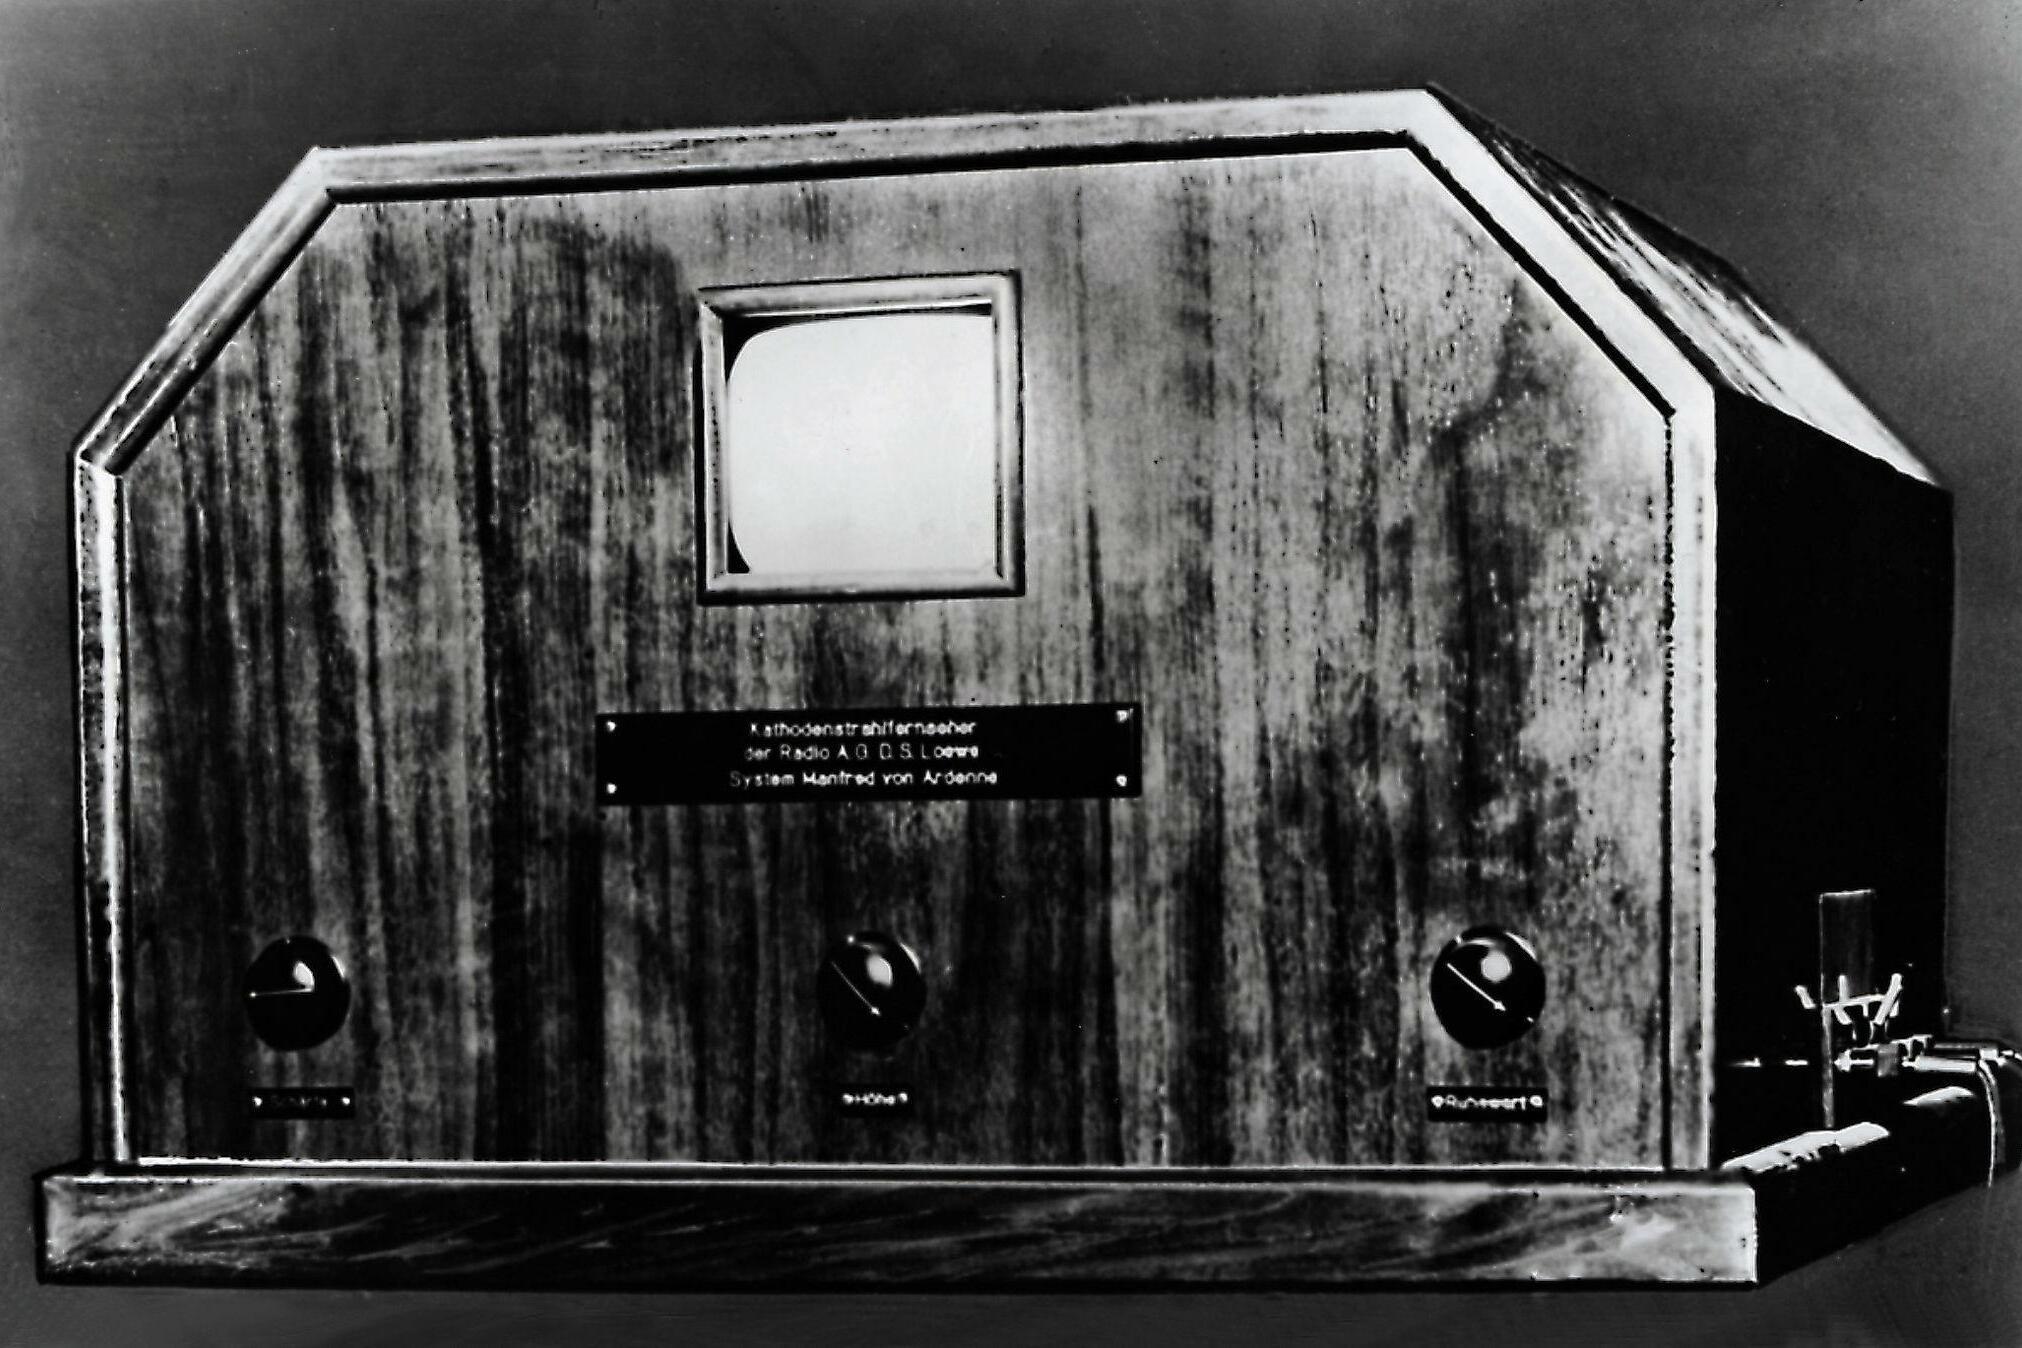 made in germany die evolution der loewe produkte it medien unternehmen handelsblatt. Black Bedroom Furniture Sets. Home Design Ideas